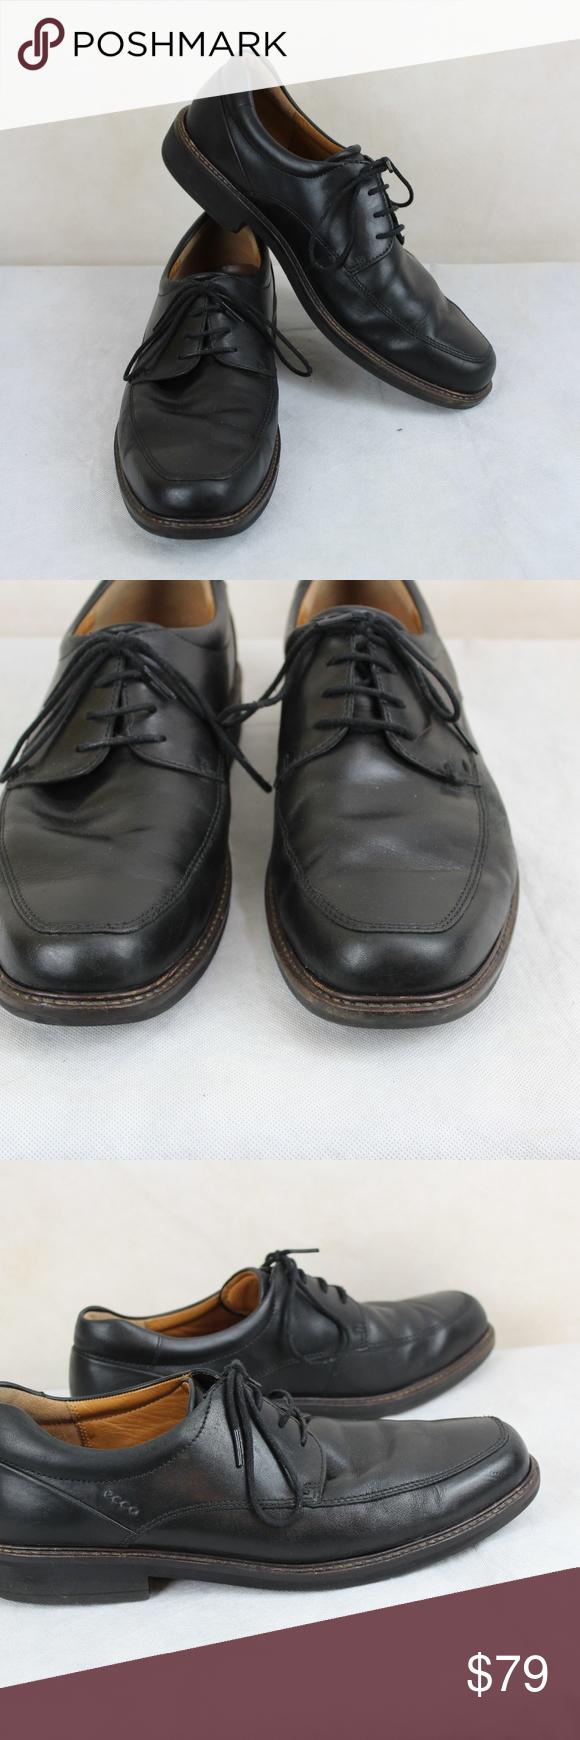 Ecco Holton Apron Toe Tie Black Leather